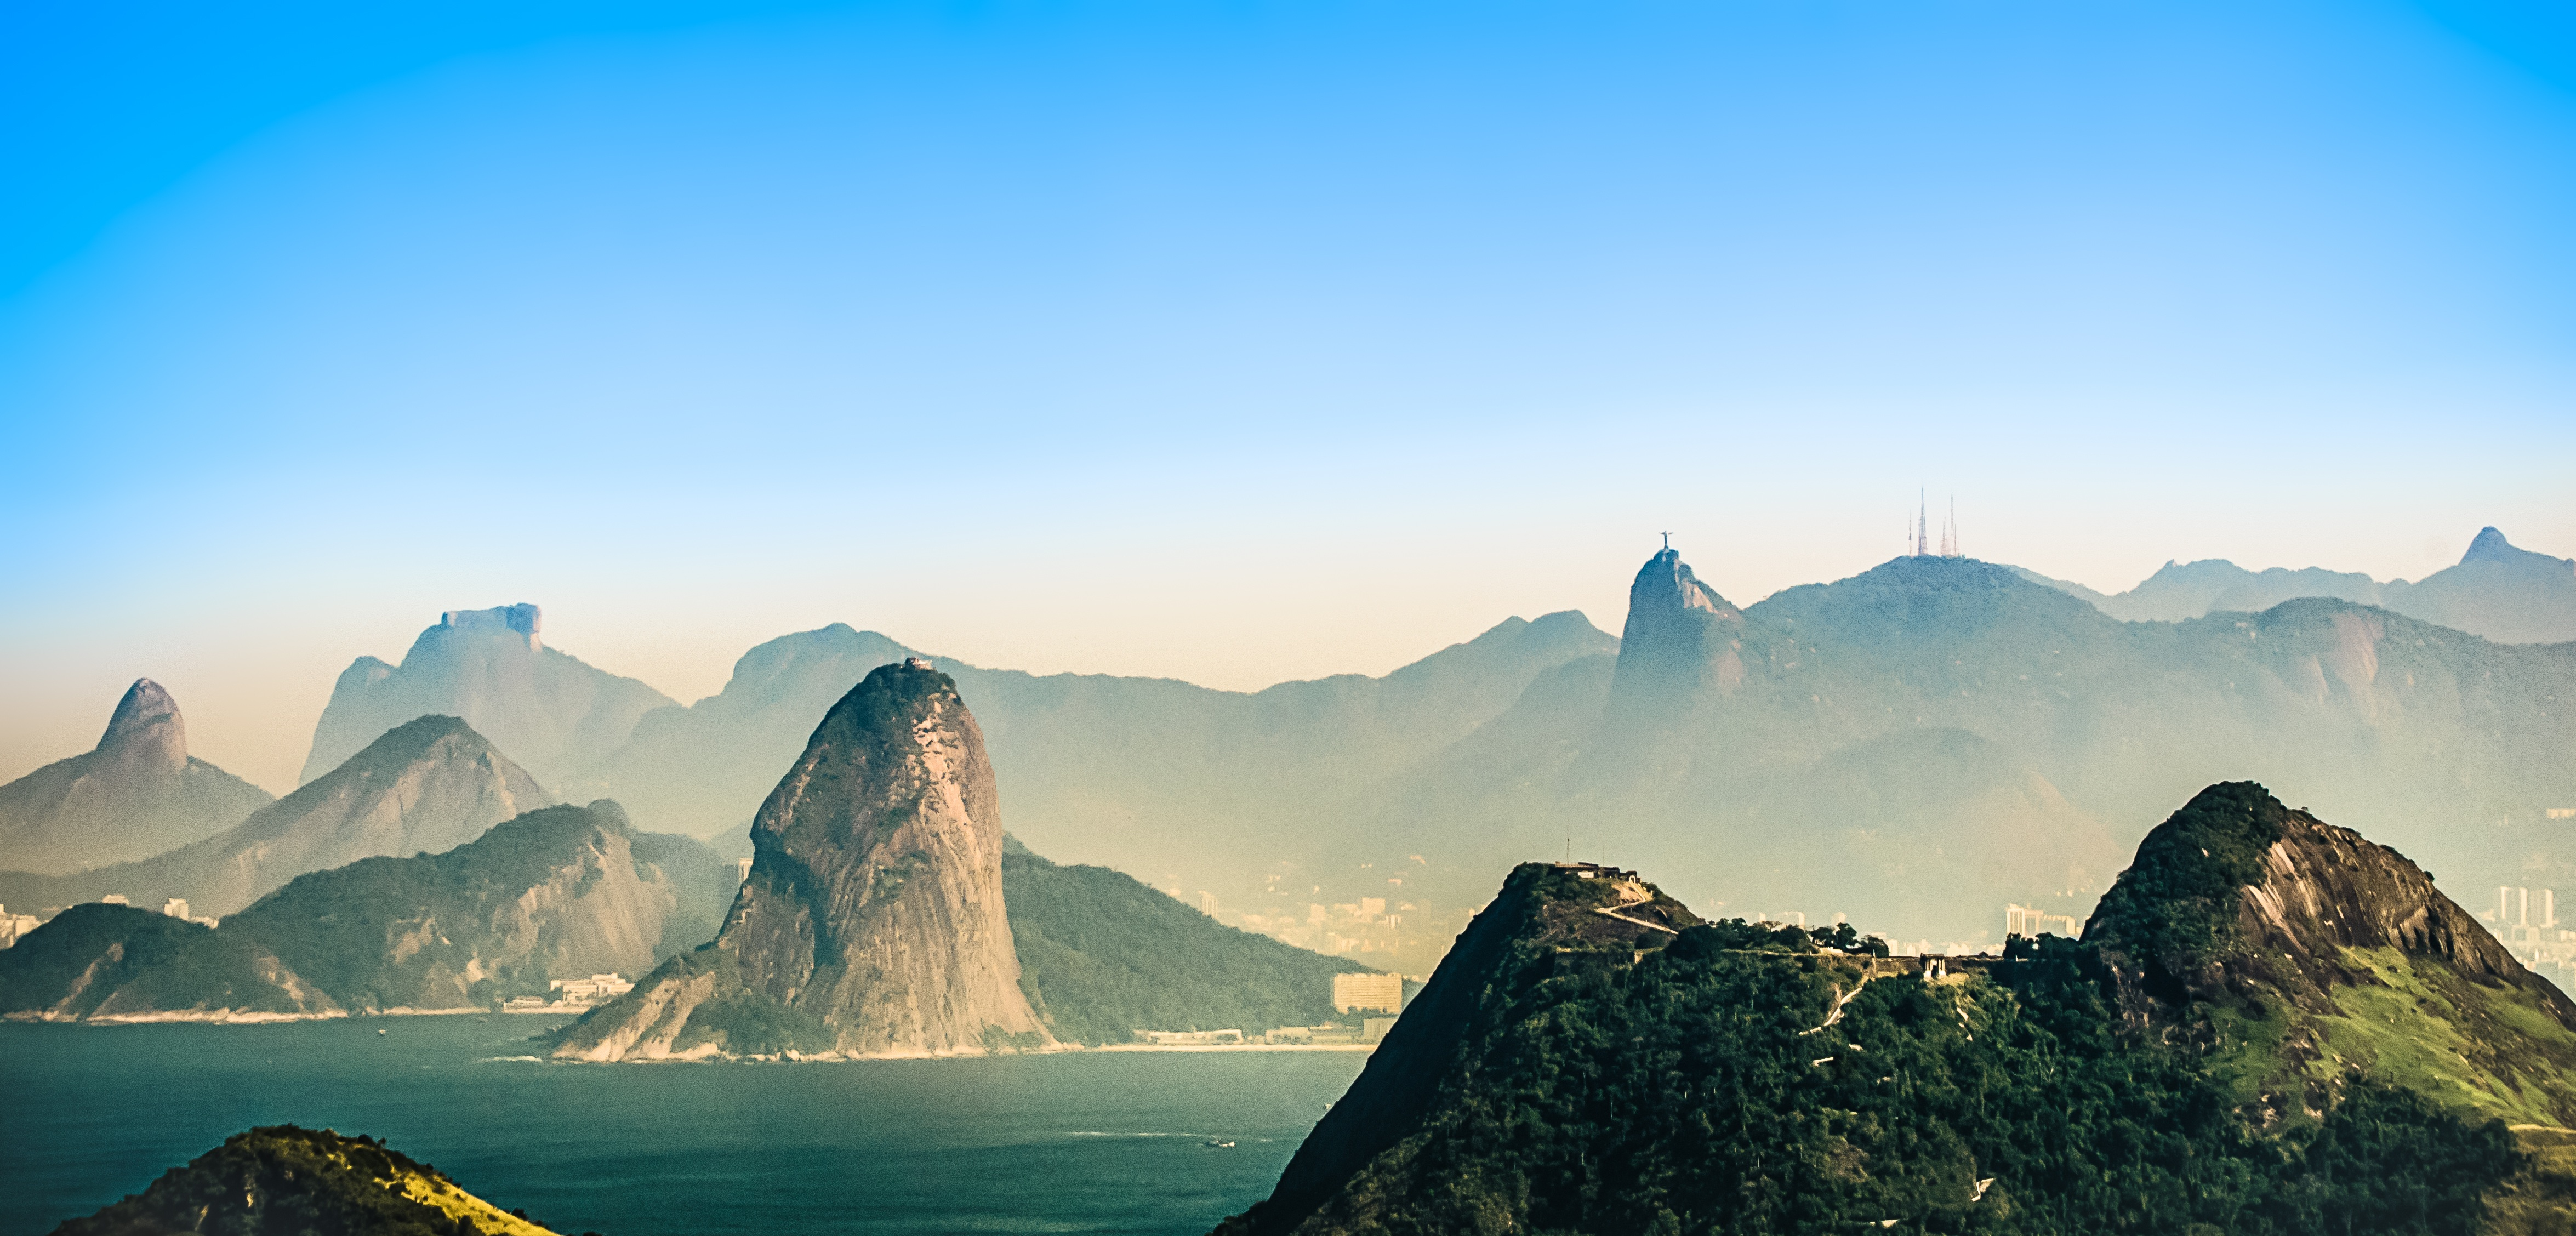 Paraíba do Sul - Rio de Janeiro